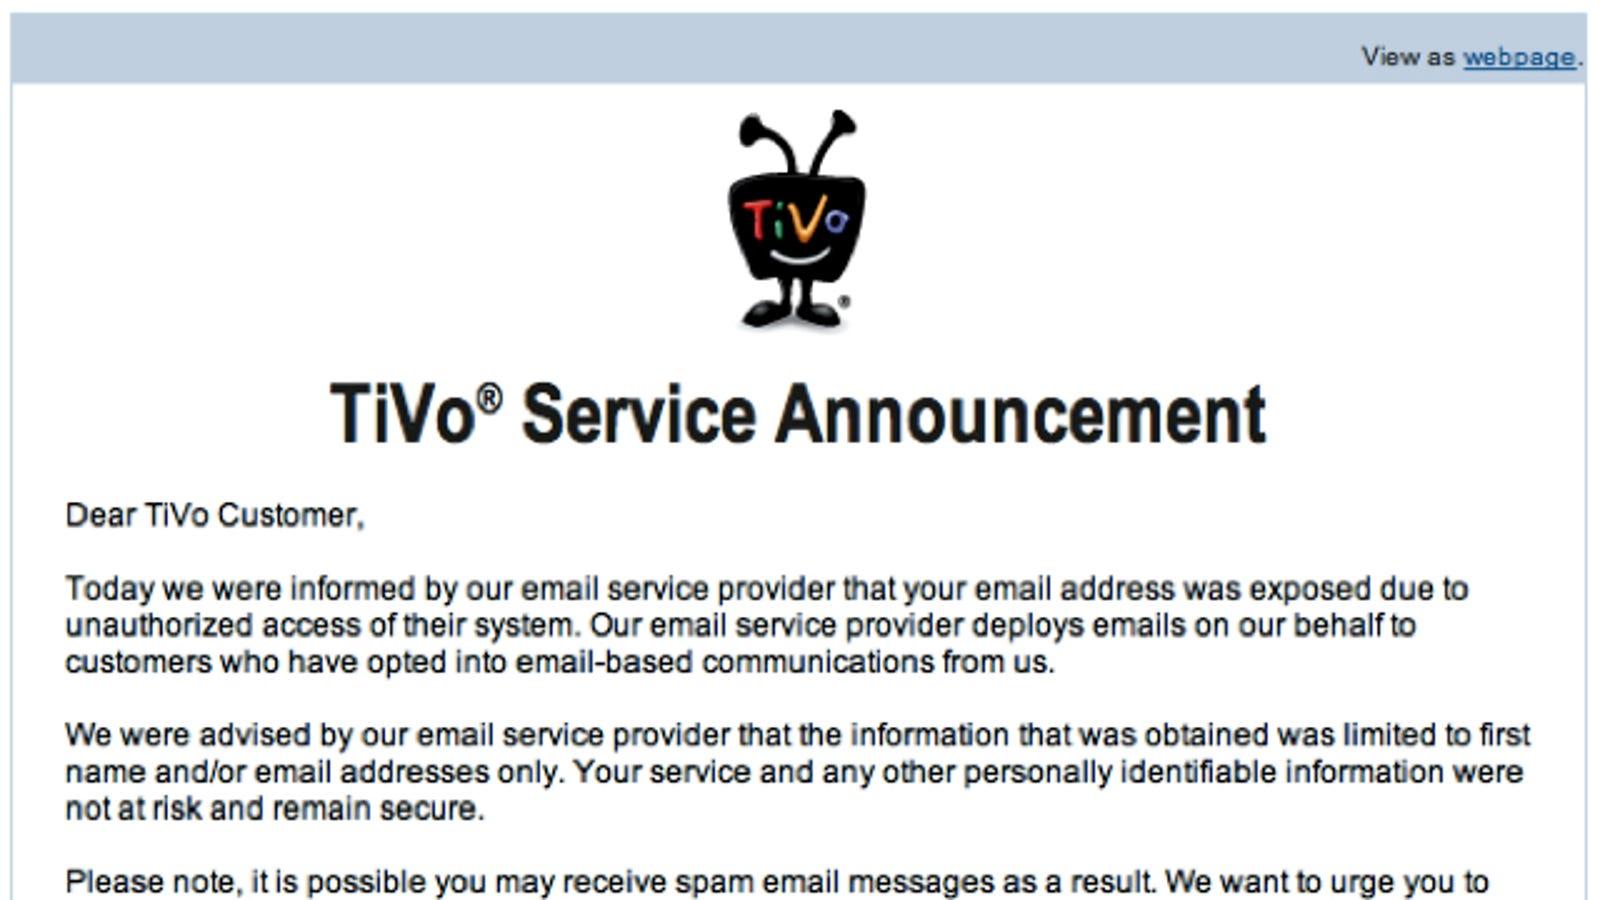 Tivo customer service